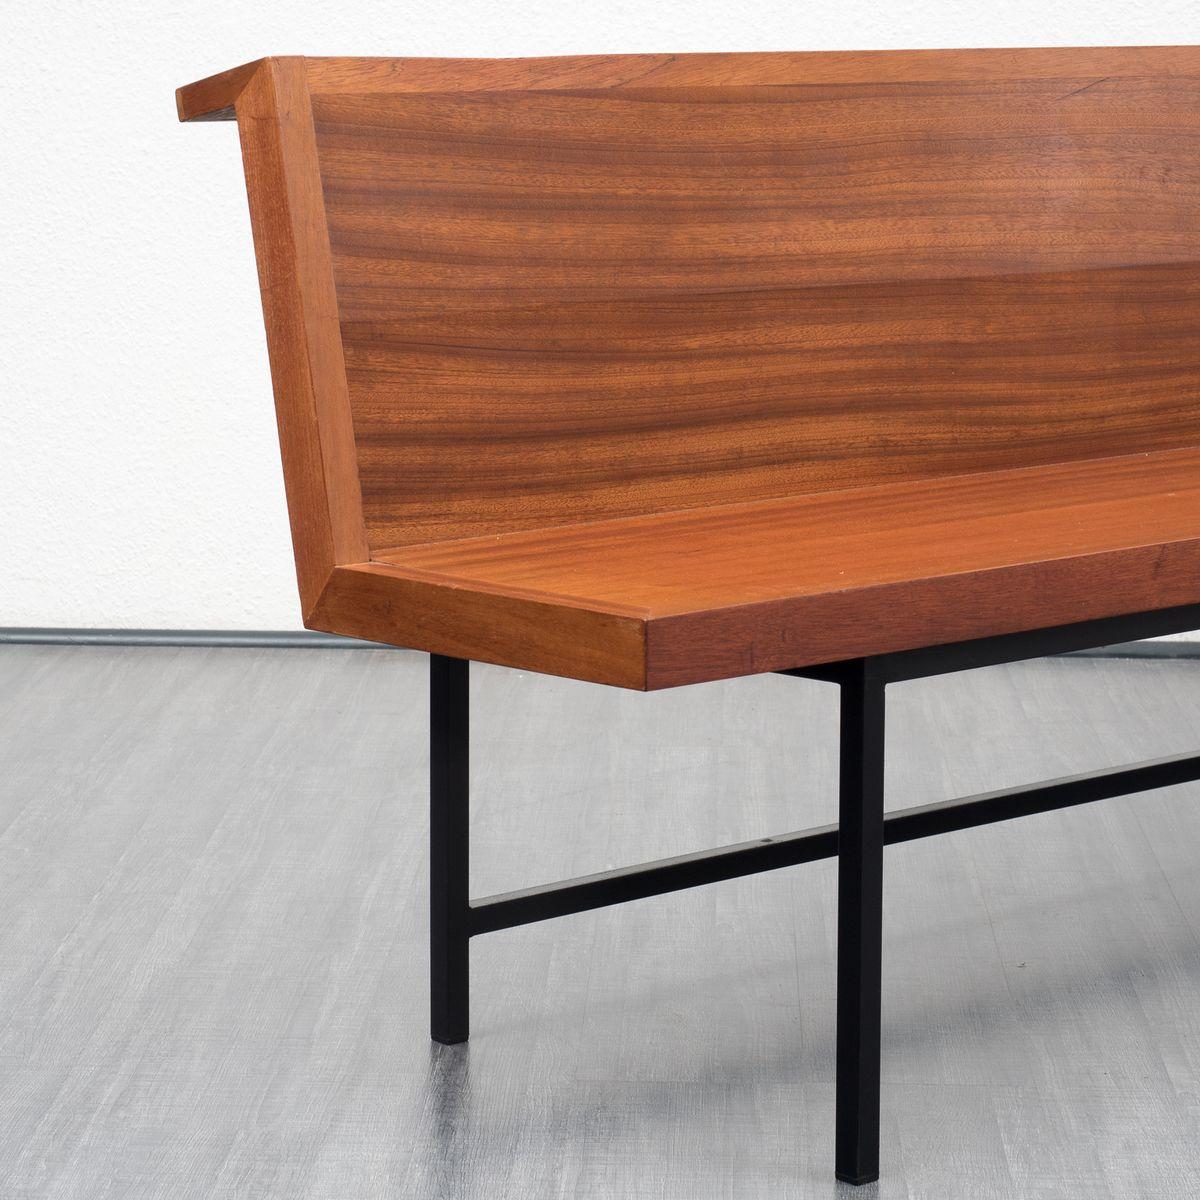 Gro e kirchenbank aus massivem holz 1960er bei pamono kaufen for Grosse esszimmertische aus holz